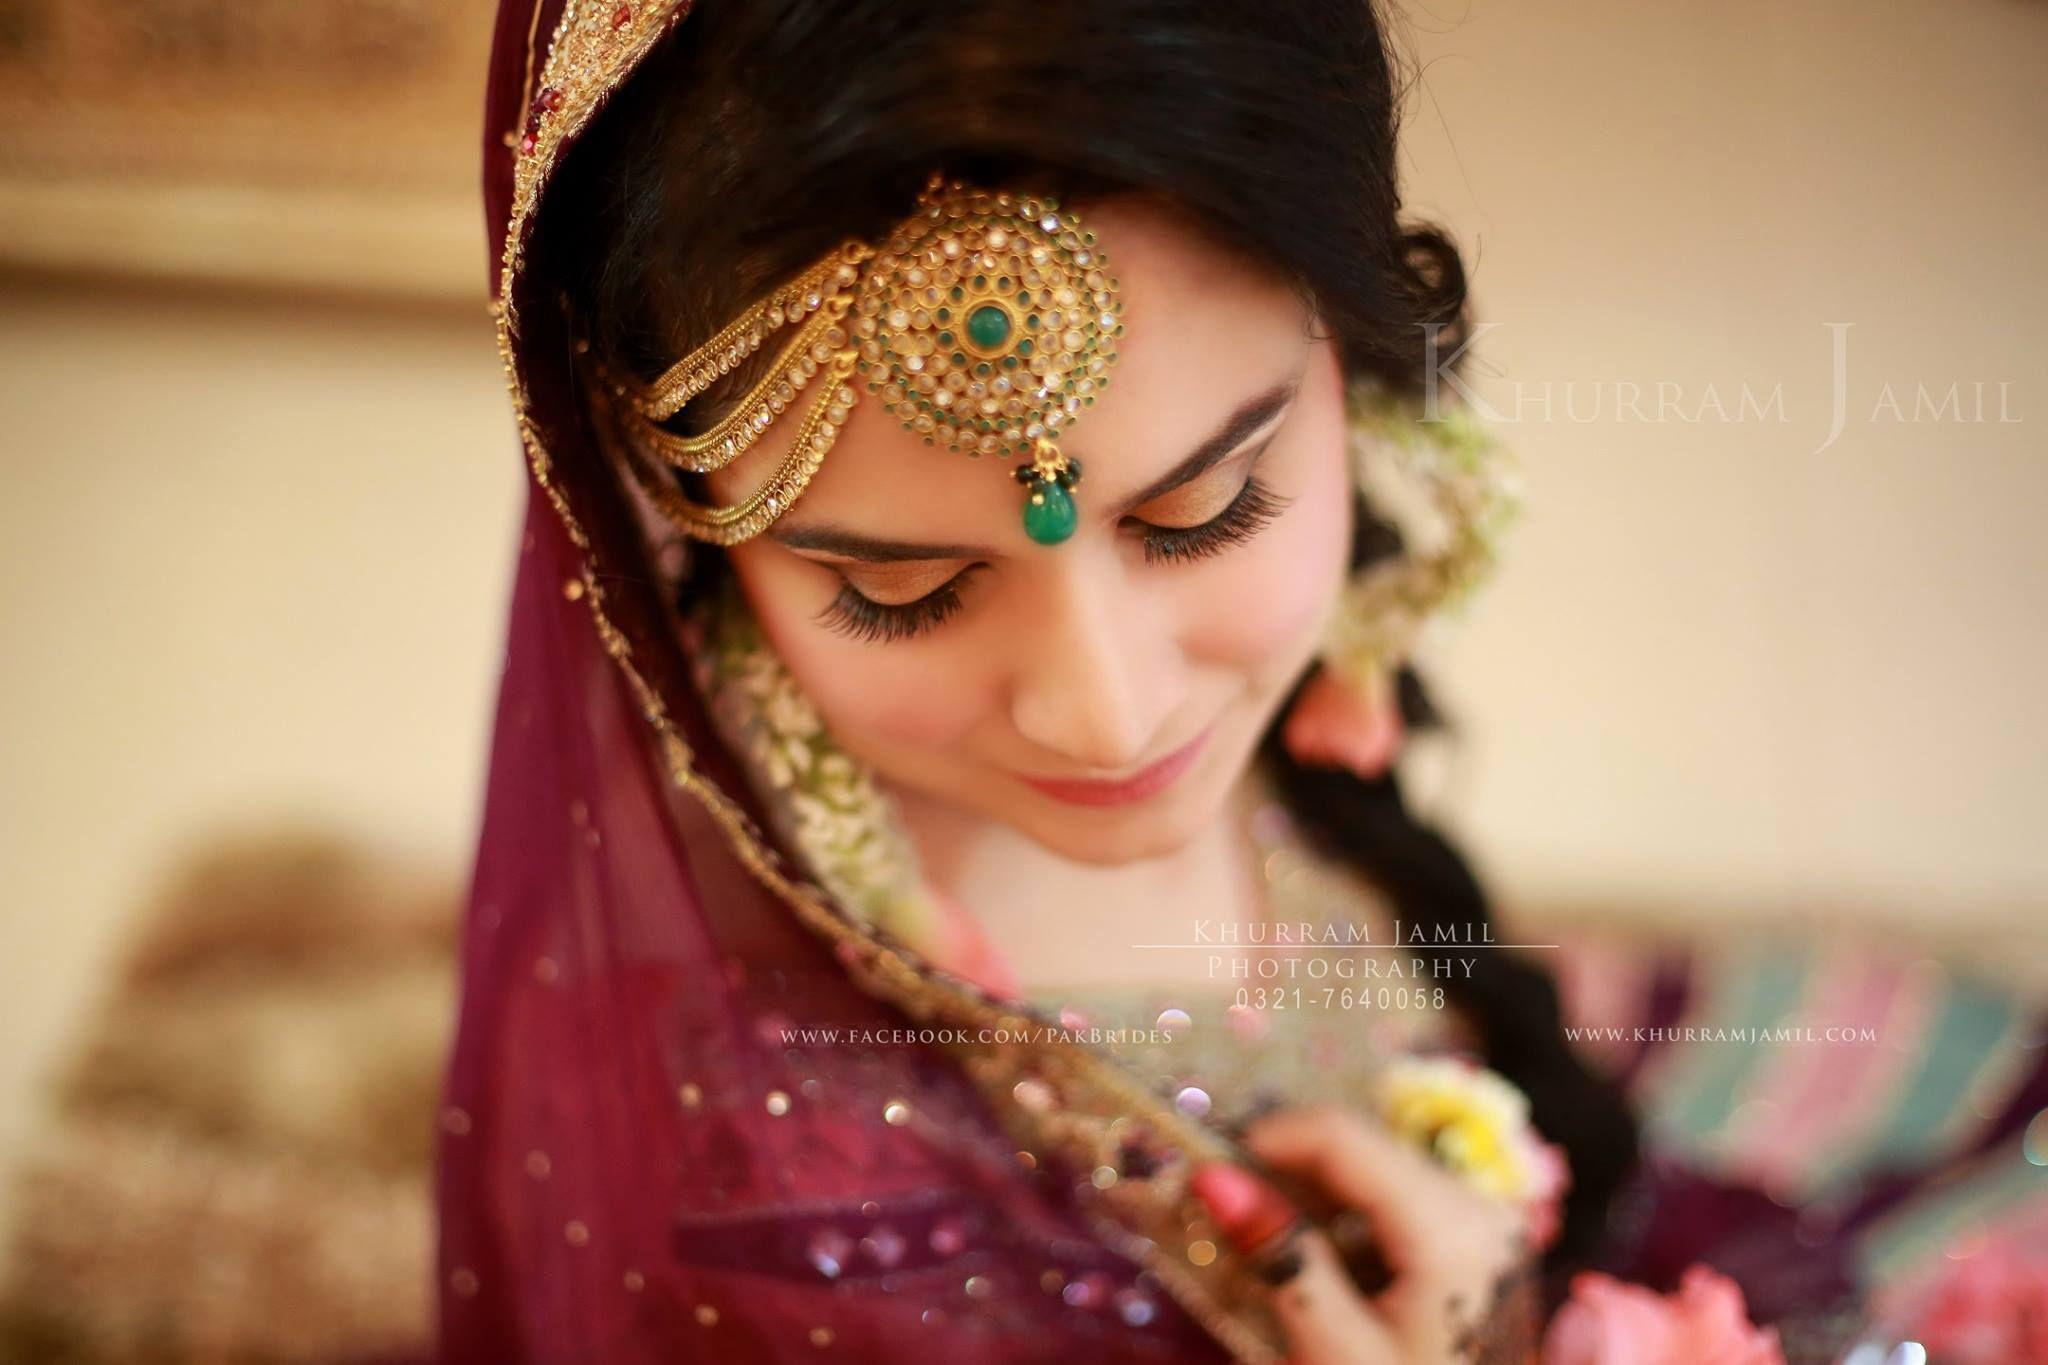 Mehndi Bridal With Matha Patti : Khurram jamil photography tika jhoomar matha patti setting